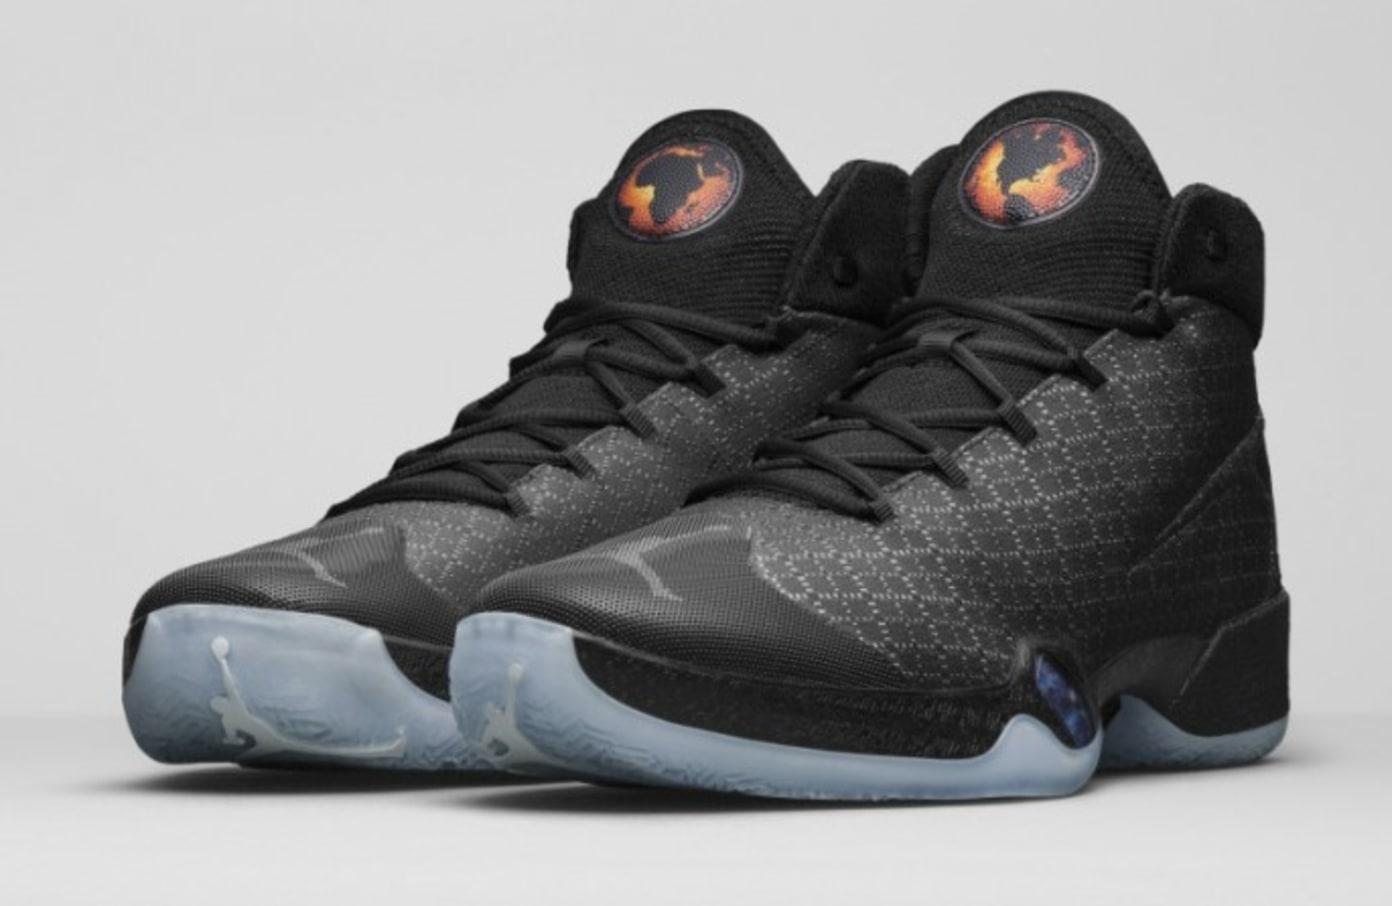 Nike Air Jordan 30 Black Cat